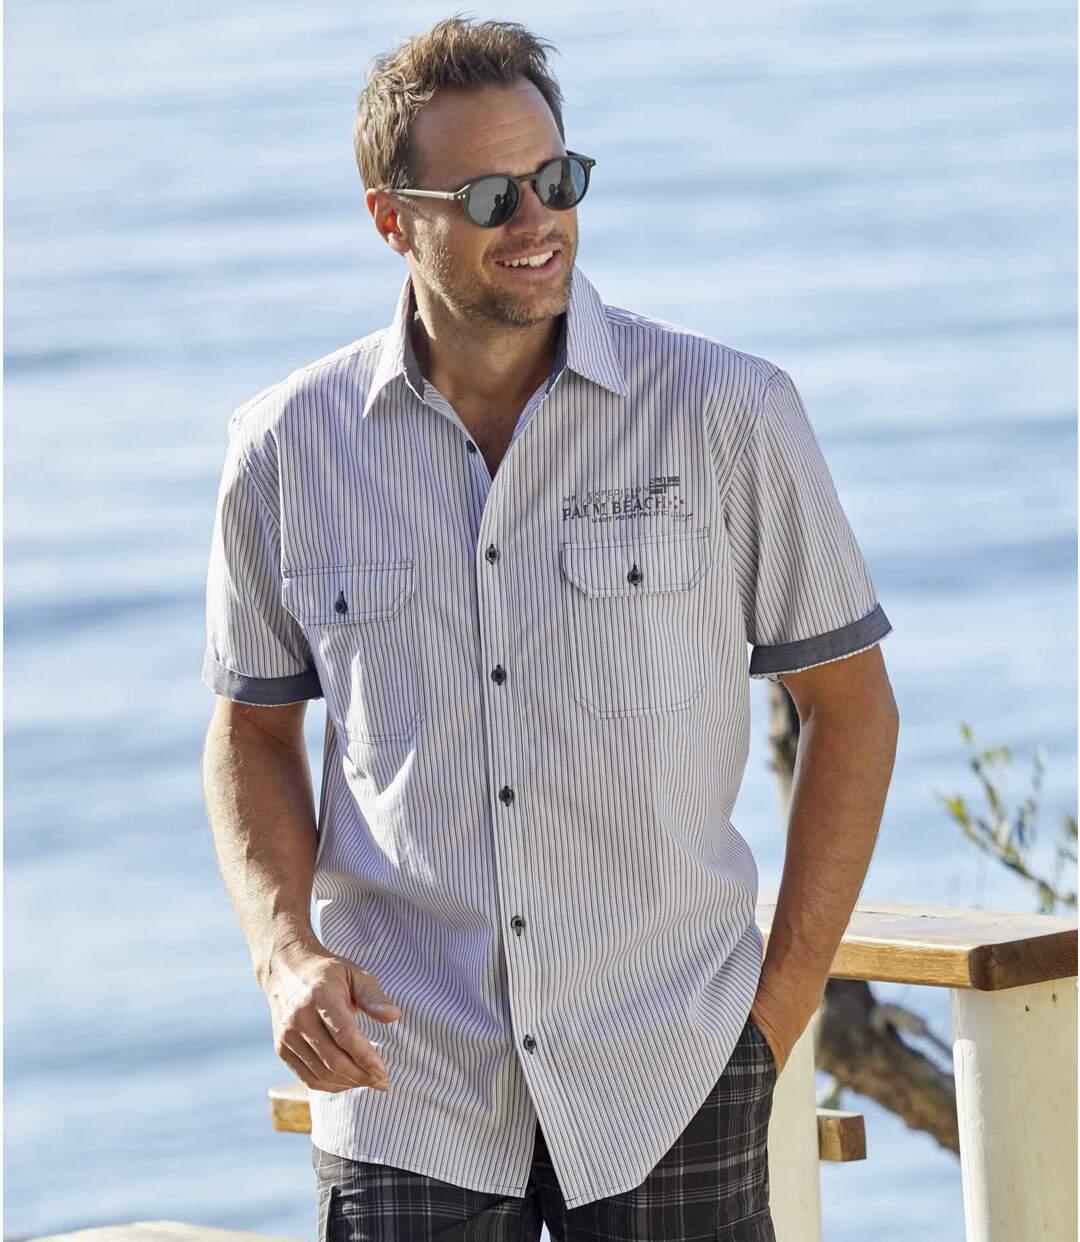 Men's Poplin Tropical Surf Shirt - White with Grey Stripes